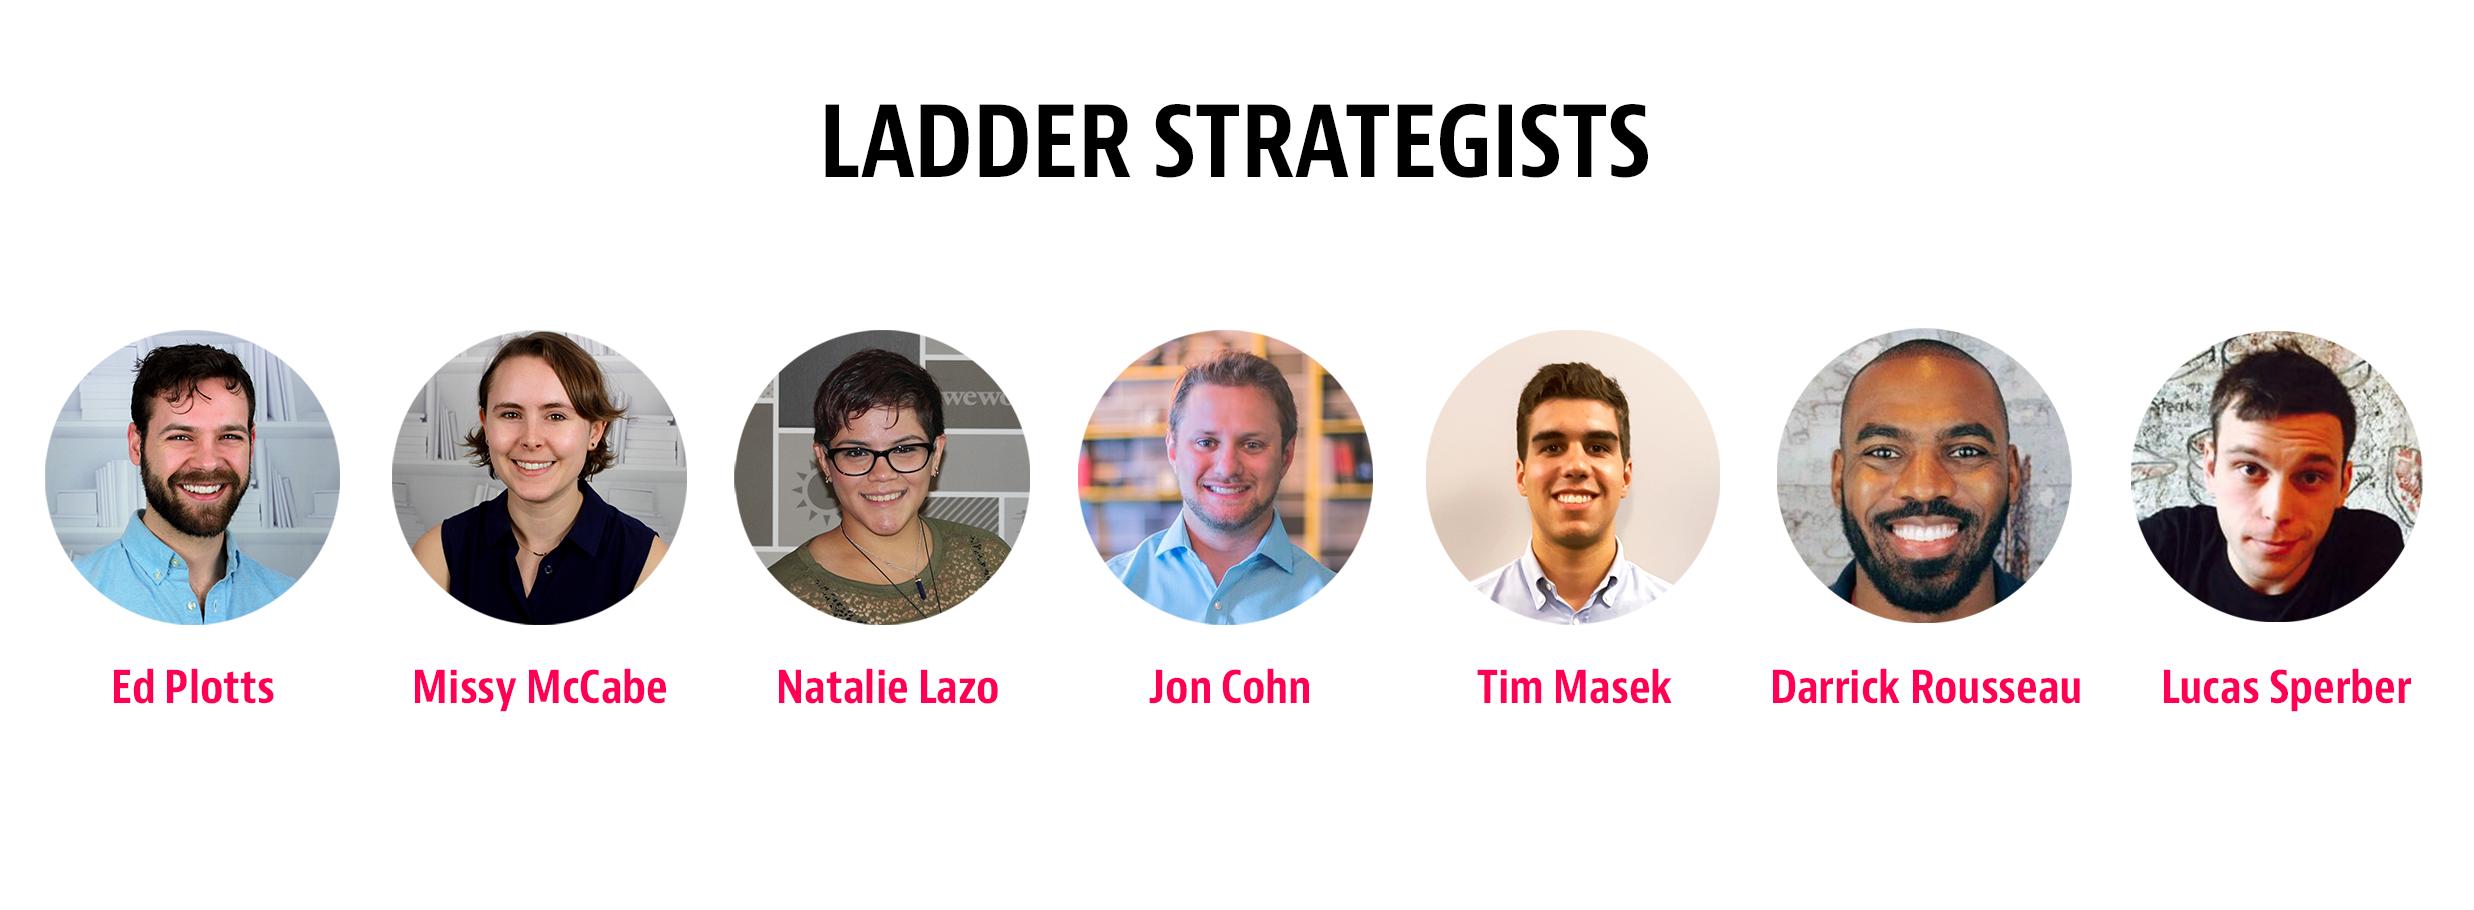 ladder strategists